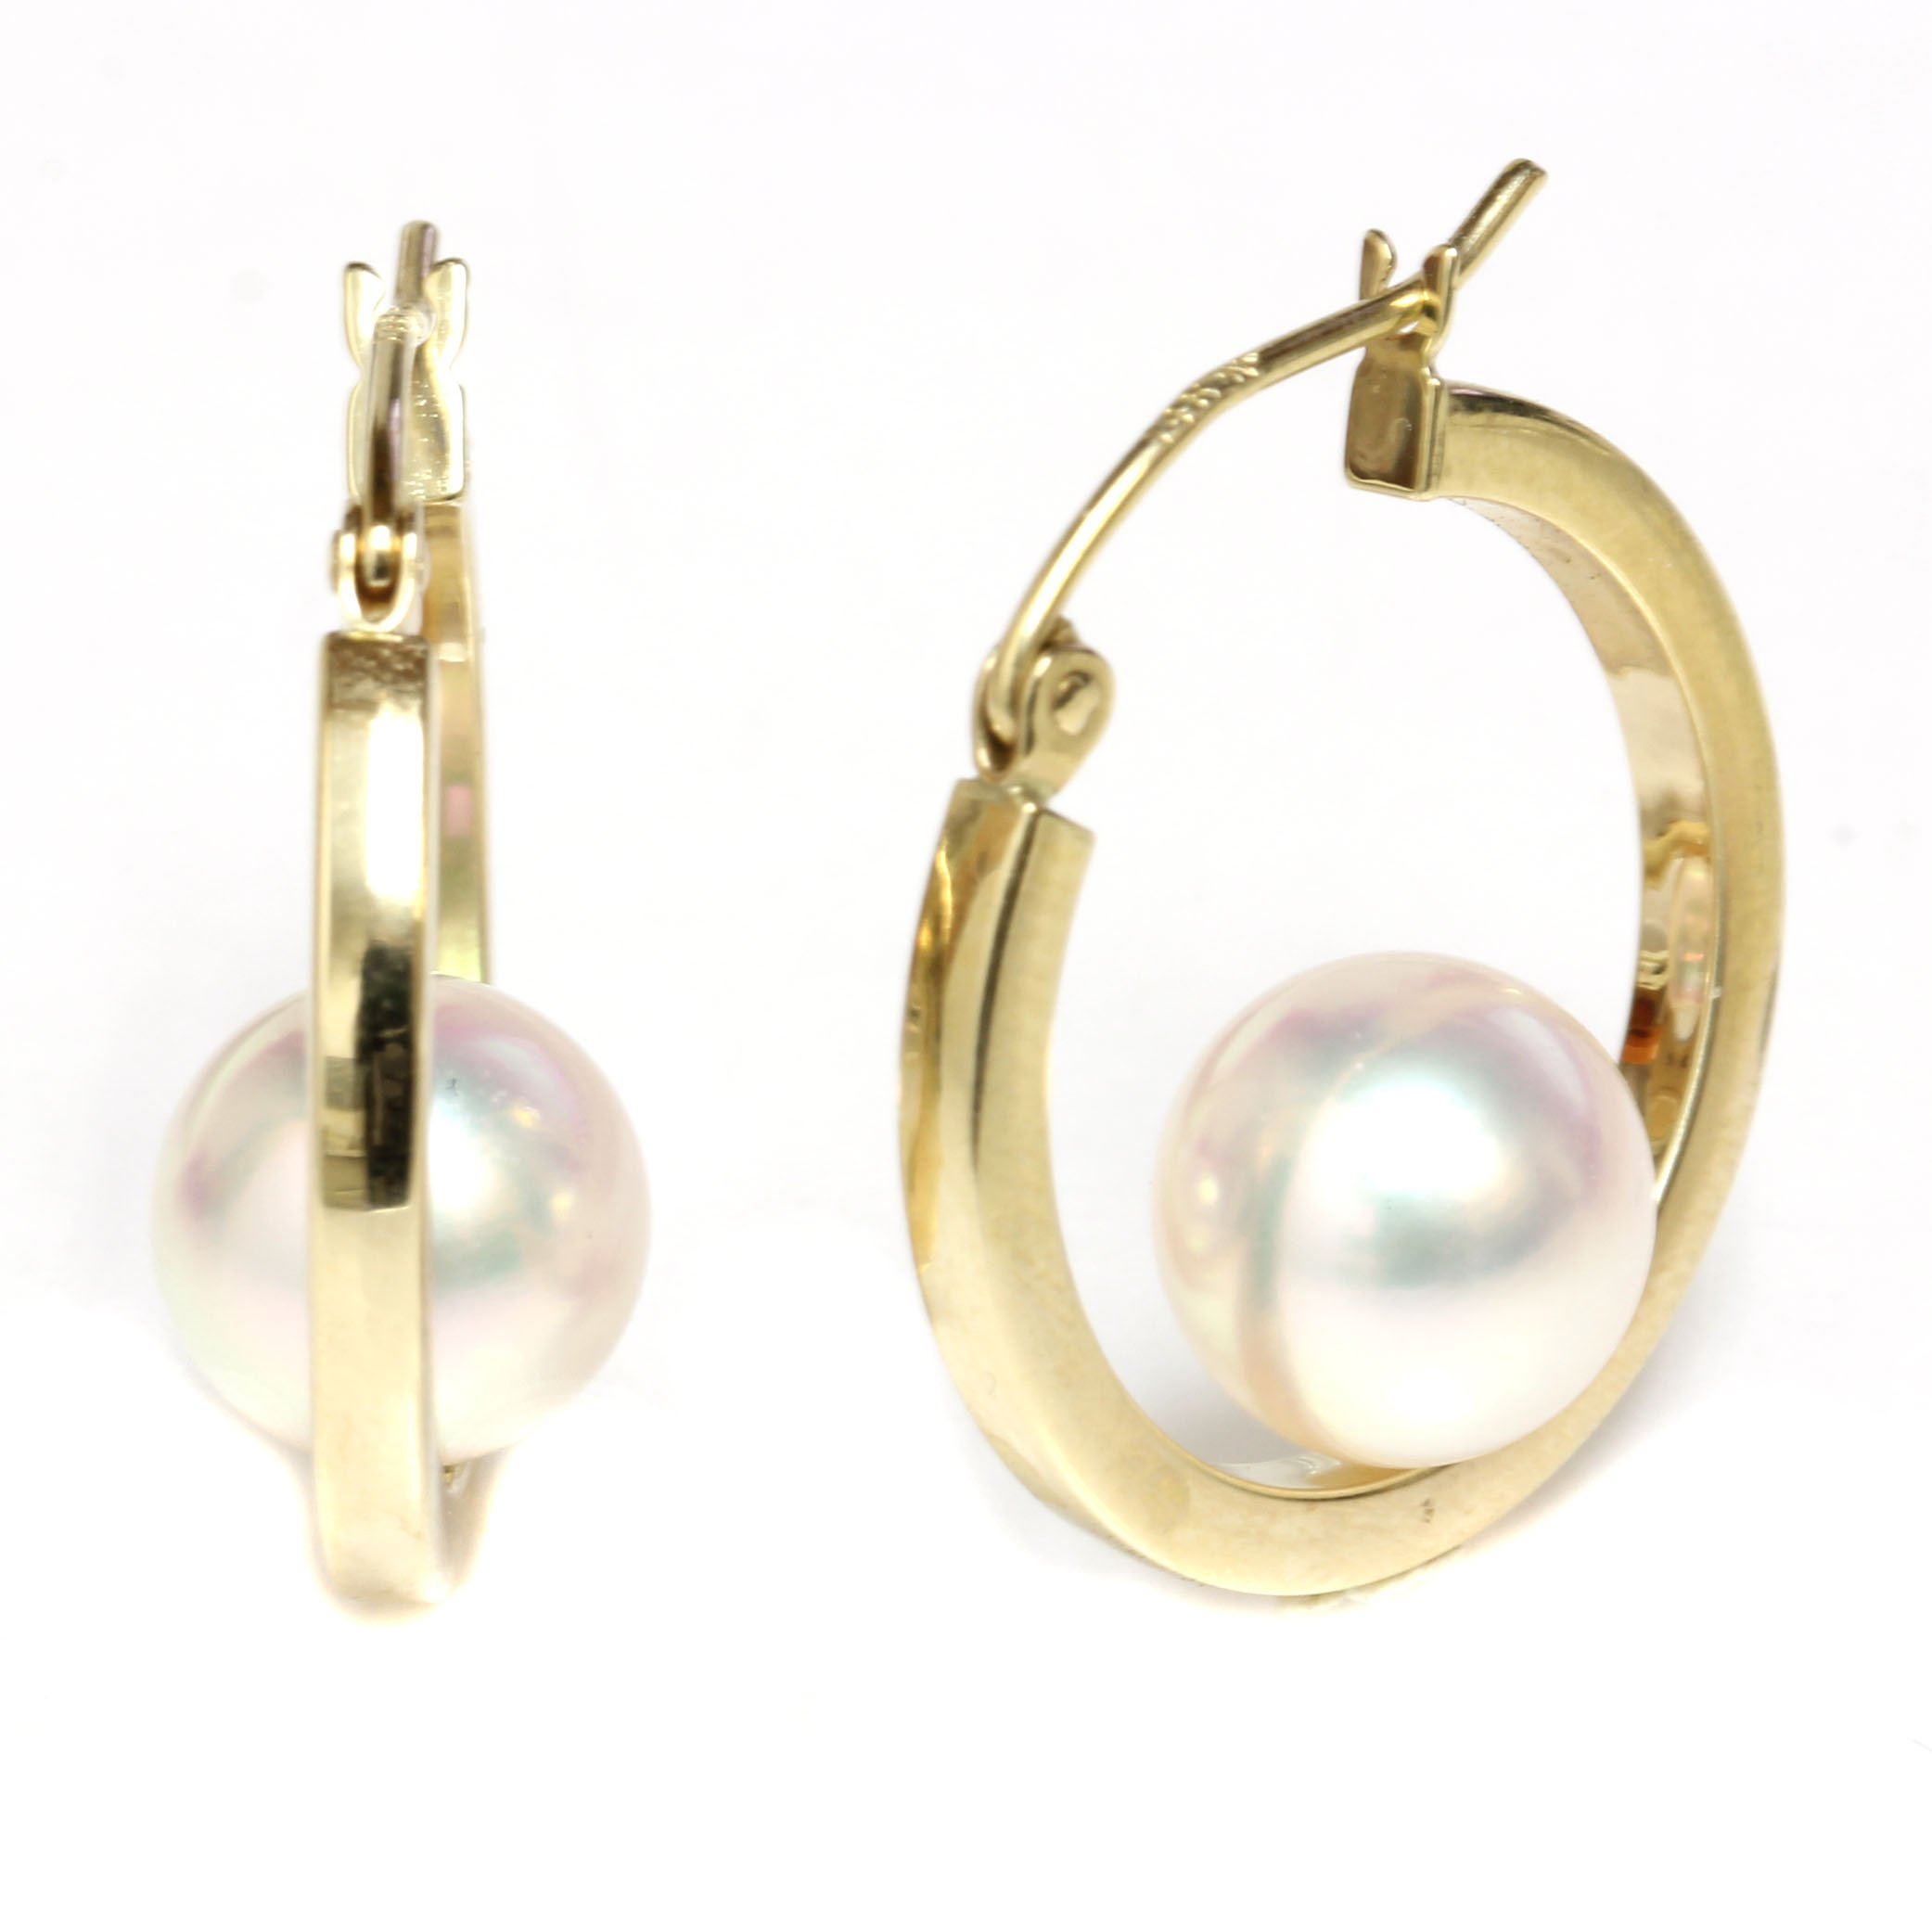 14k Yellow Gold Cultured Saltwater Akoya Pearl Dangle Hoop earrings - AAA and AAA Flawless (7.0-7.5mm AAA) by Seven Seas Pearls (Image #1)